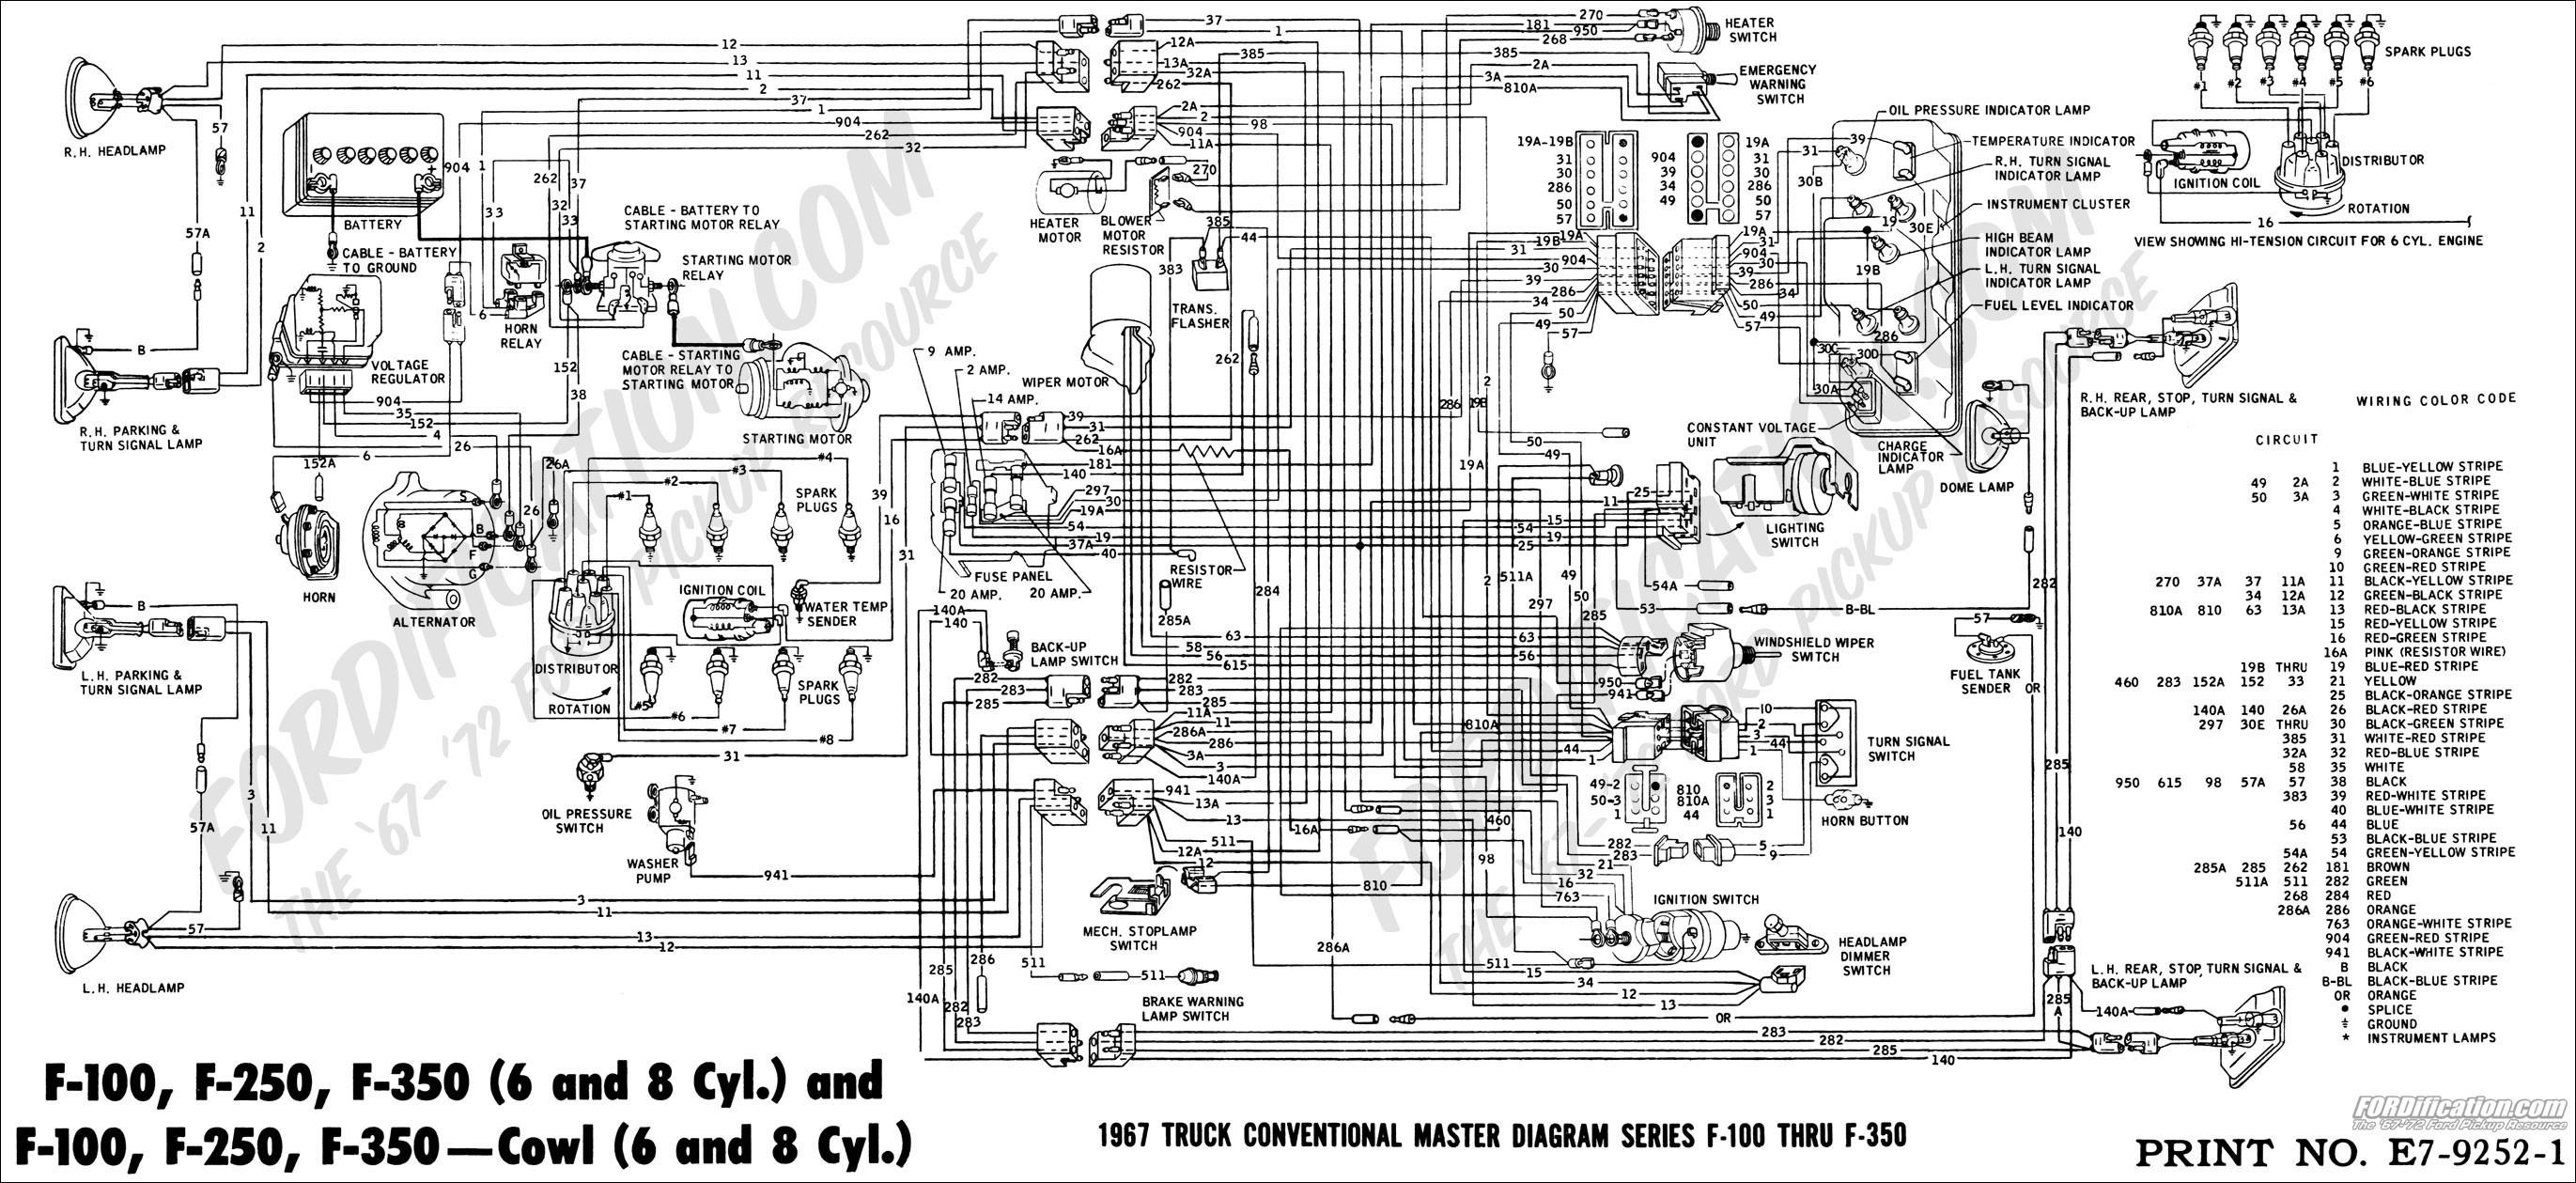 Schema Electrique Ford Ranger 2013